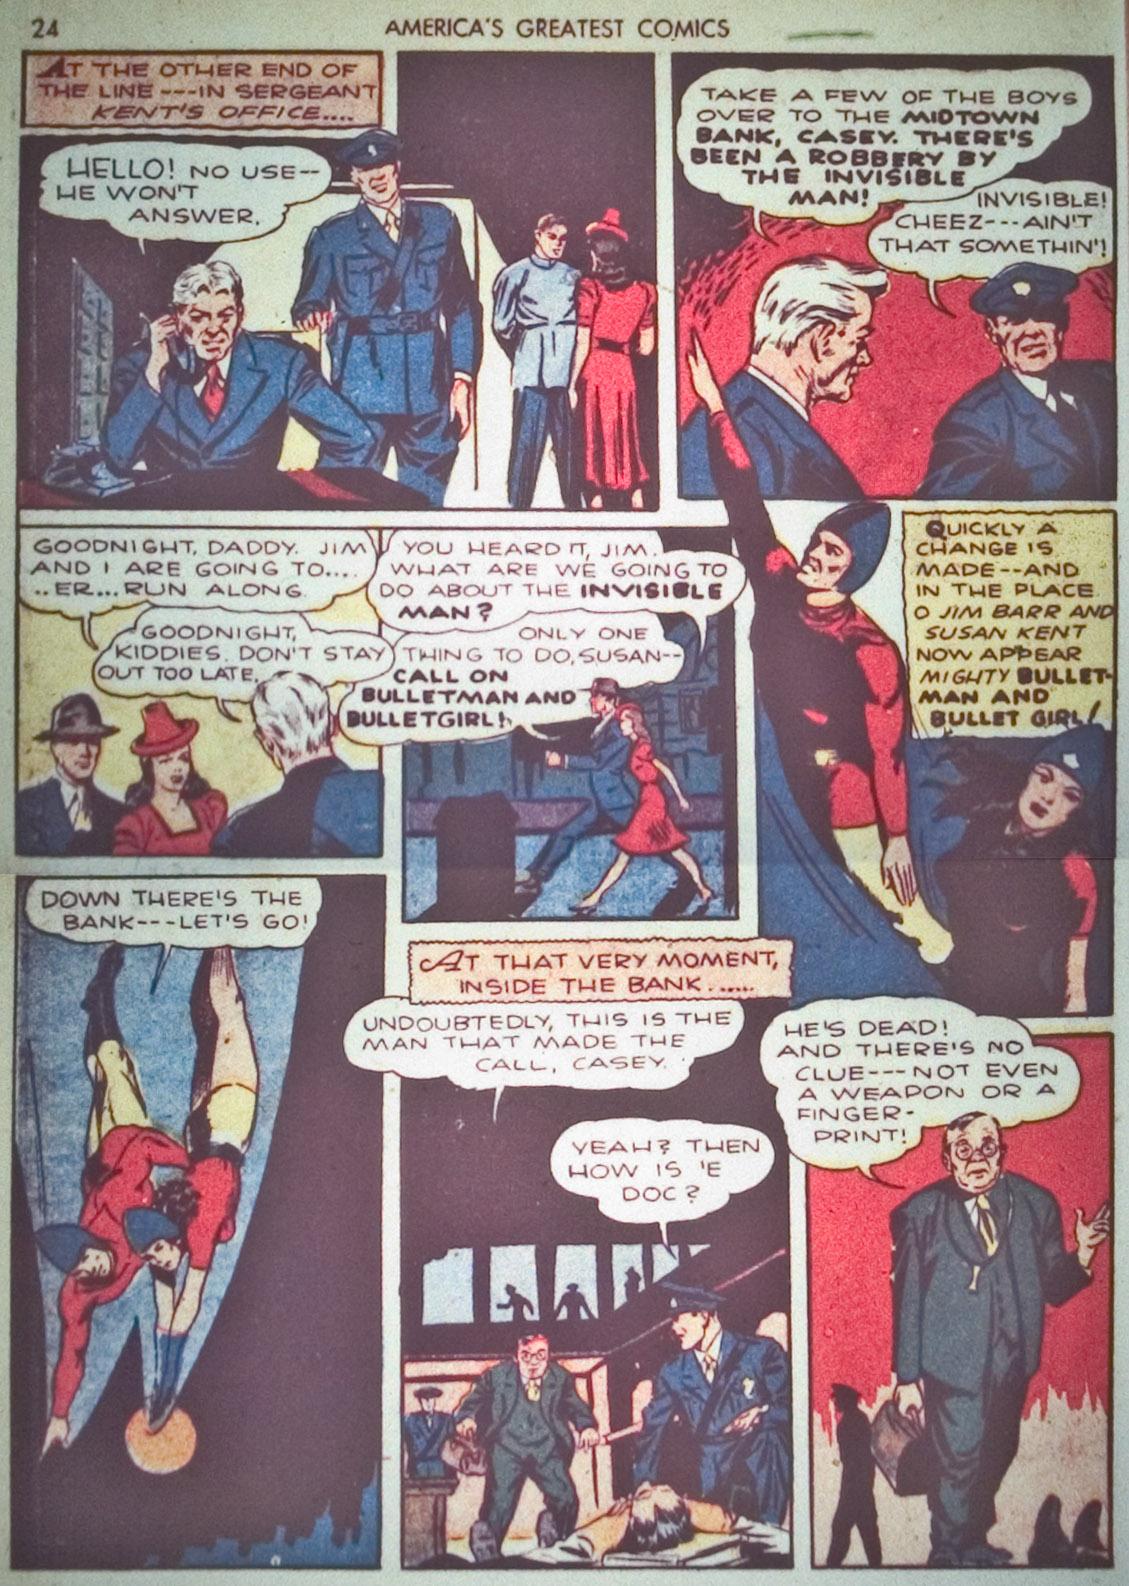 Read online America's Greatest Comics comic -  Issue #1 - 27